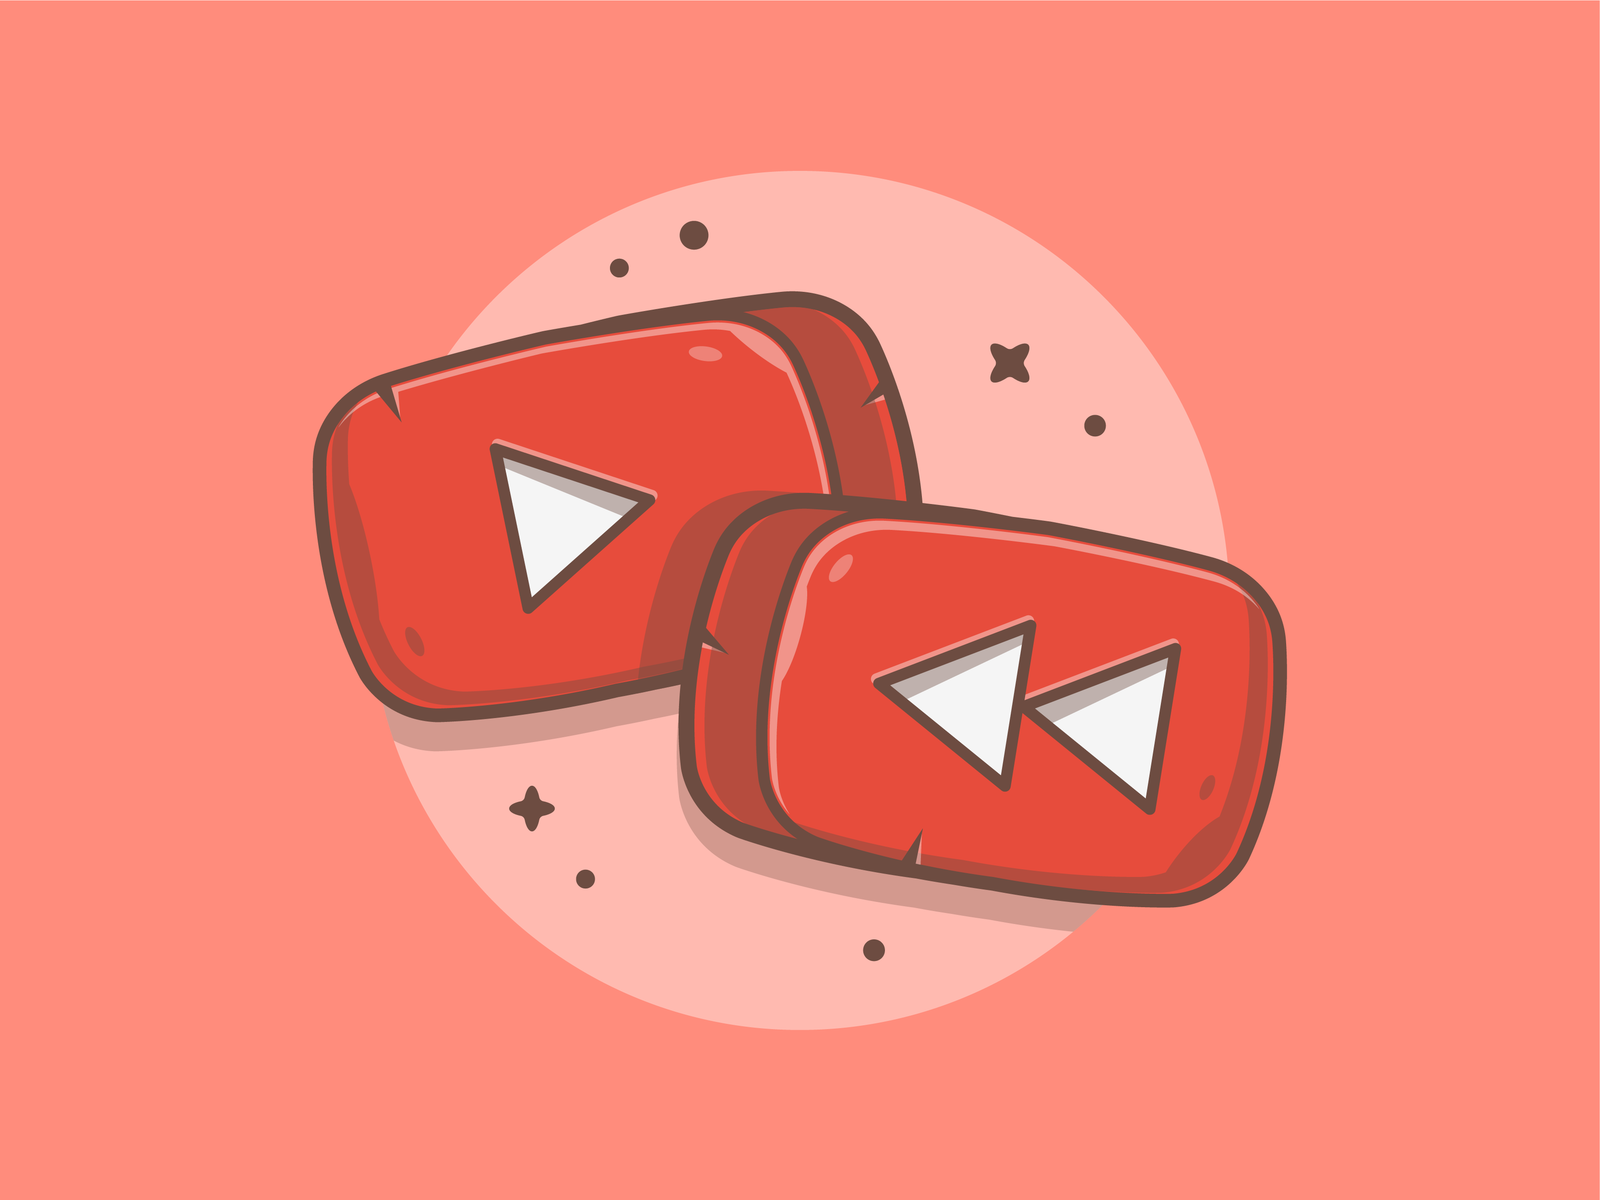 YouTube Rewind 😁🤓 in 2020 Youtube logo, Youtube rewind